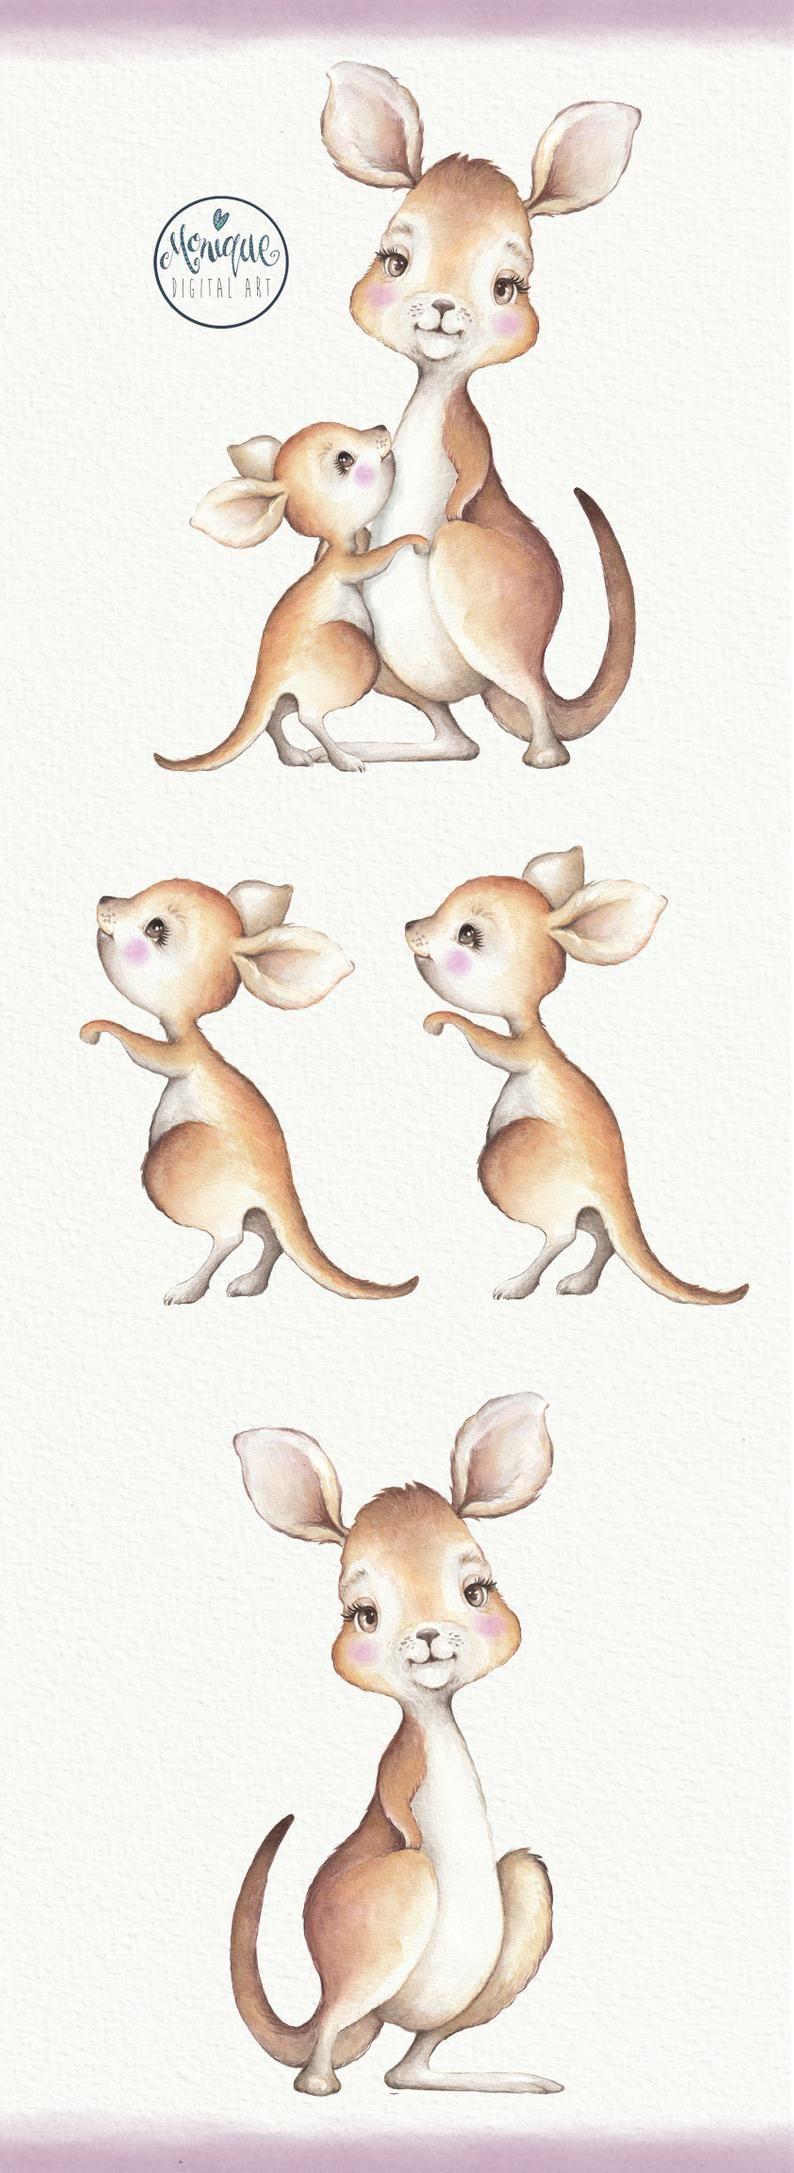 Kangaroo Clipart Watercolor Mum Baby Kangaroo Kangaroo Art Etsy Kangaroo Art Kangaroo Drawing Baby Animal Prints